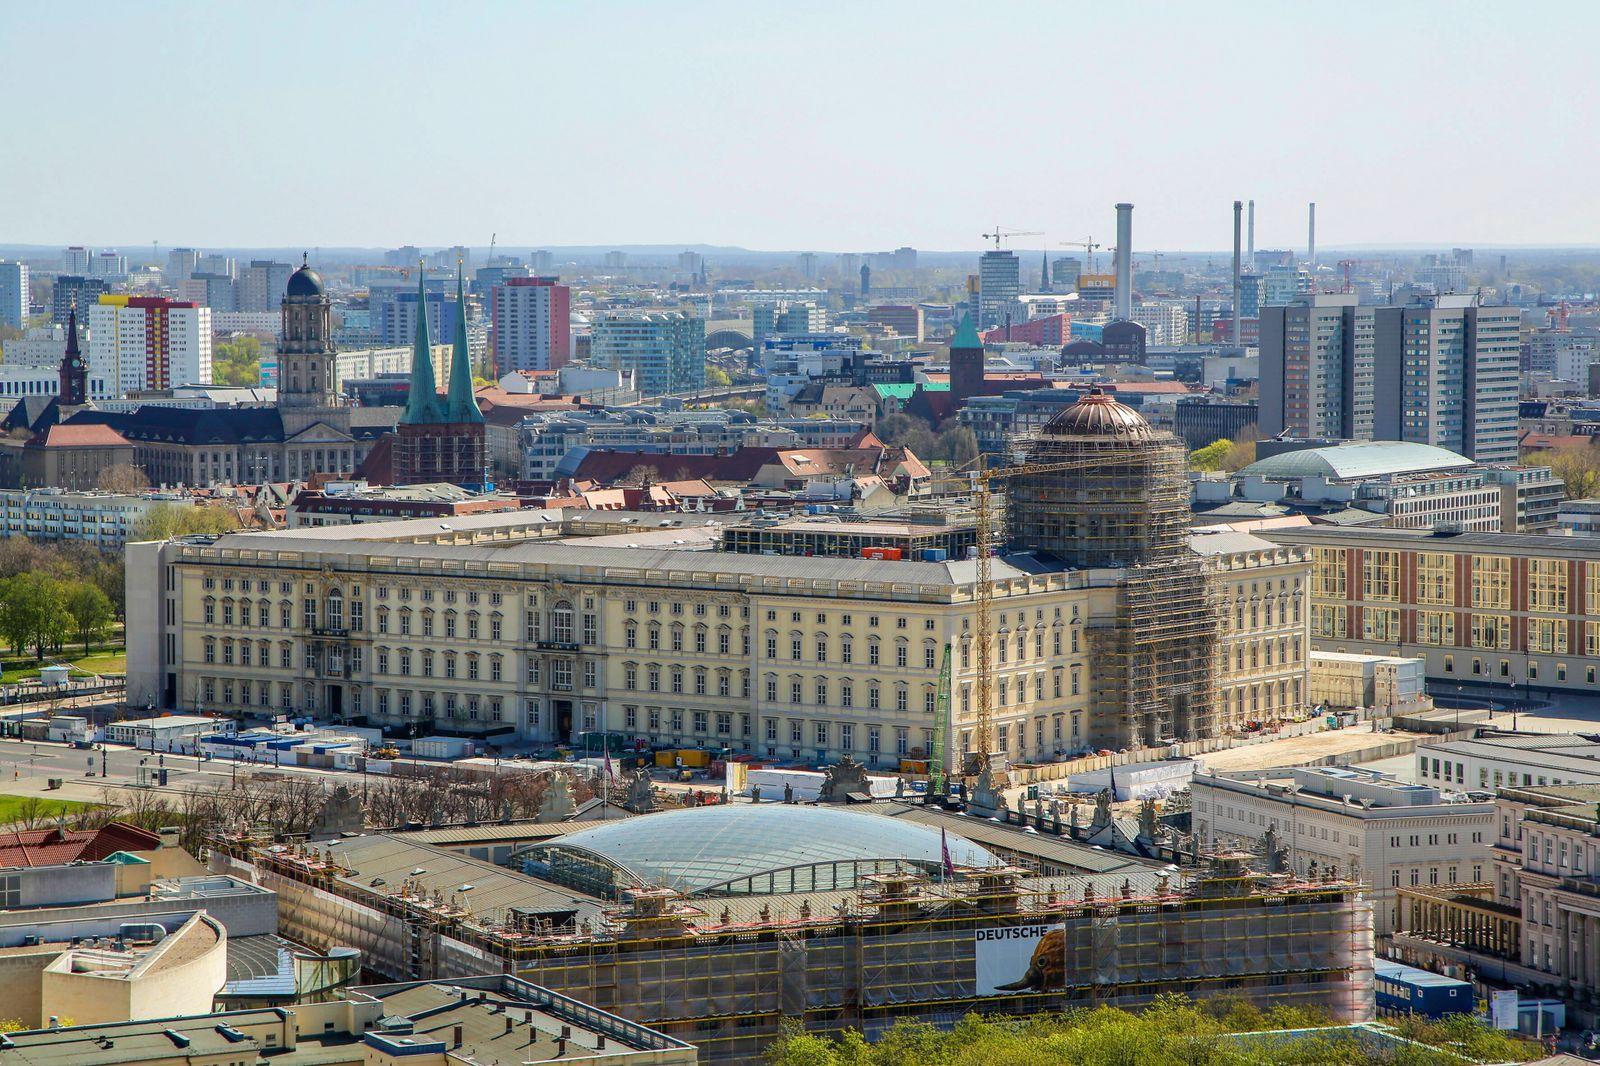 10.04.2020, Berlin, Deutschland - Stadtansicht Berlin. Foto: Das Humboldt Forum bzw. Berliner Stadtschloss. Am unteren B